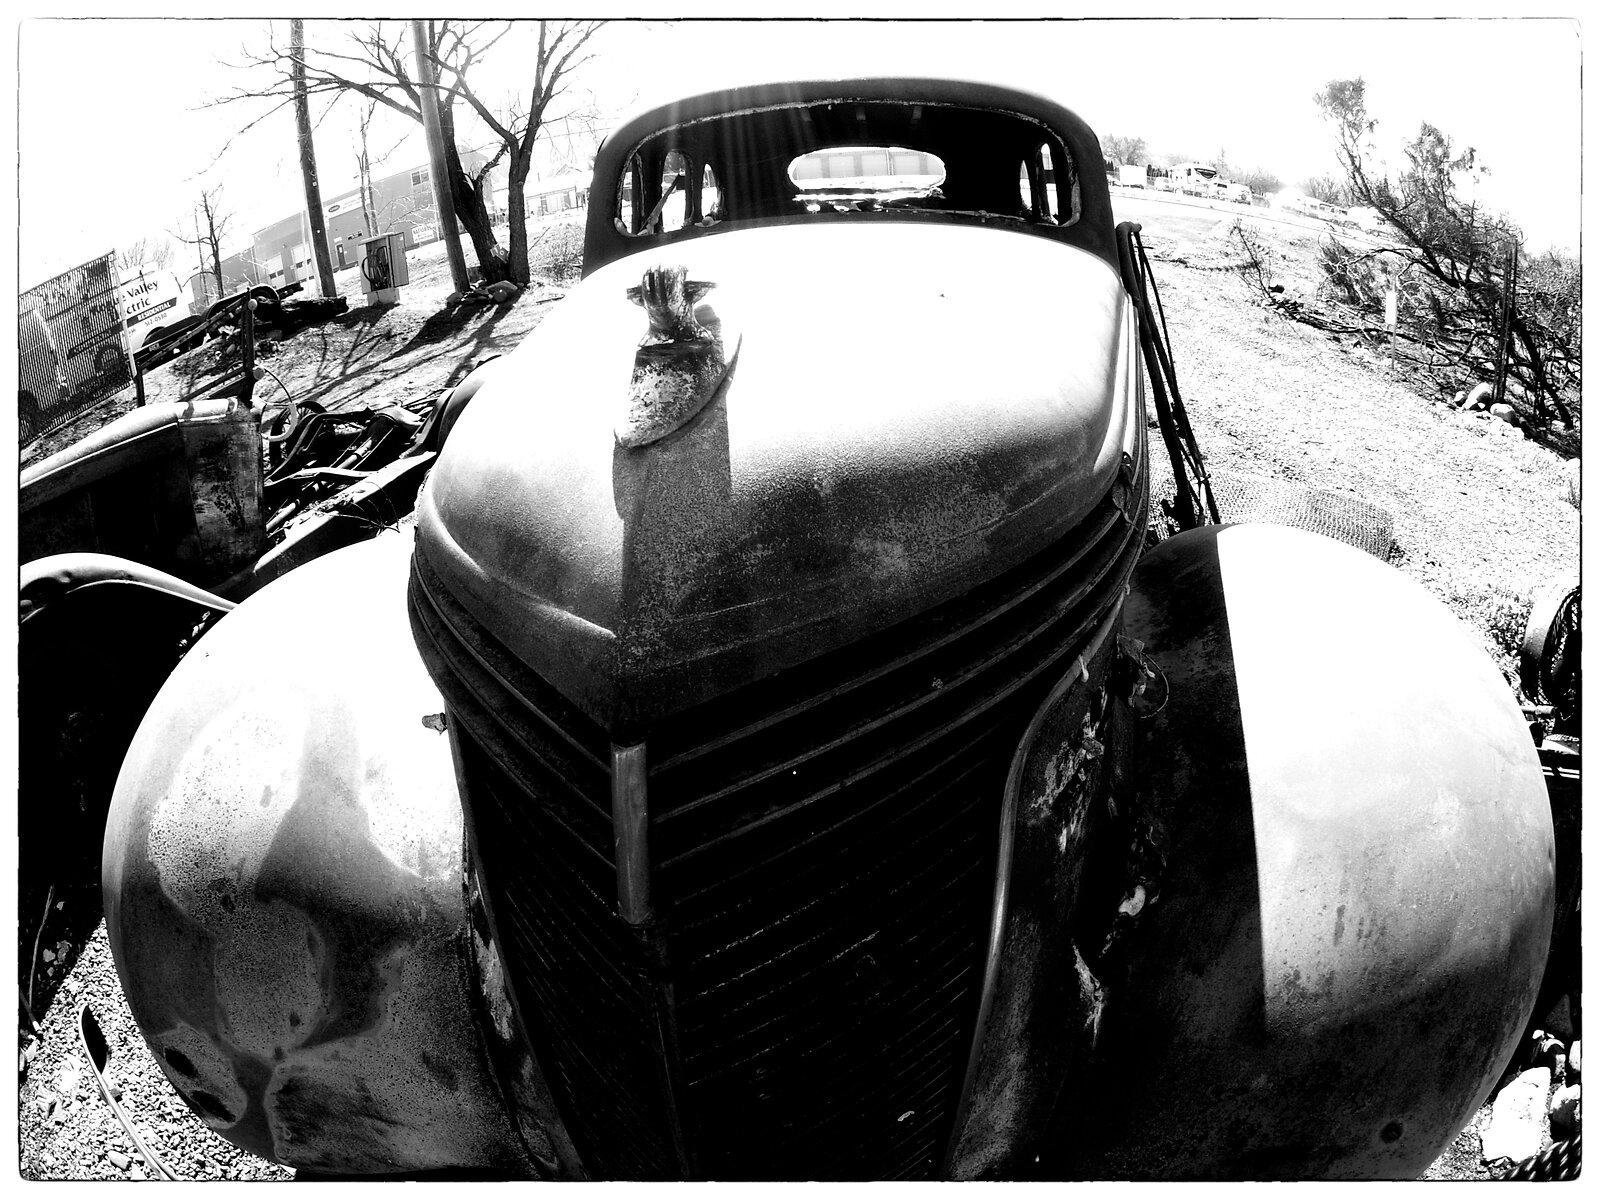 Q7_Mar3_21_Studebaker(bold_mono).jpg